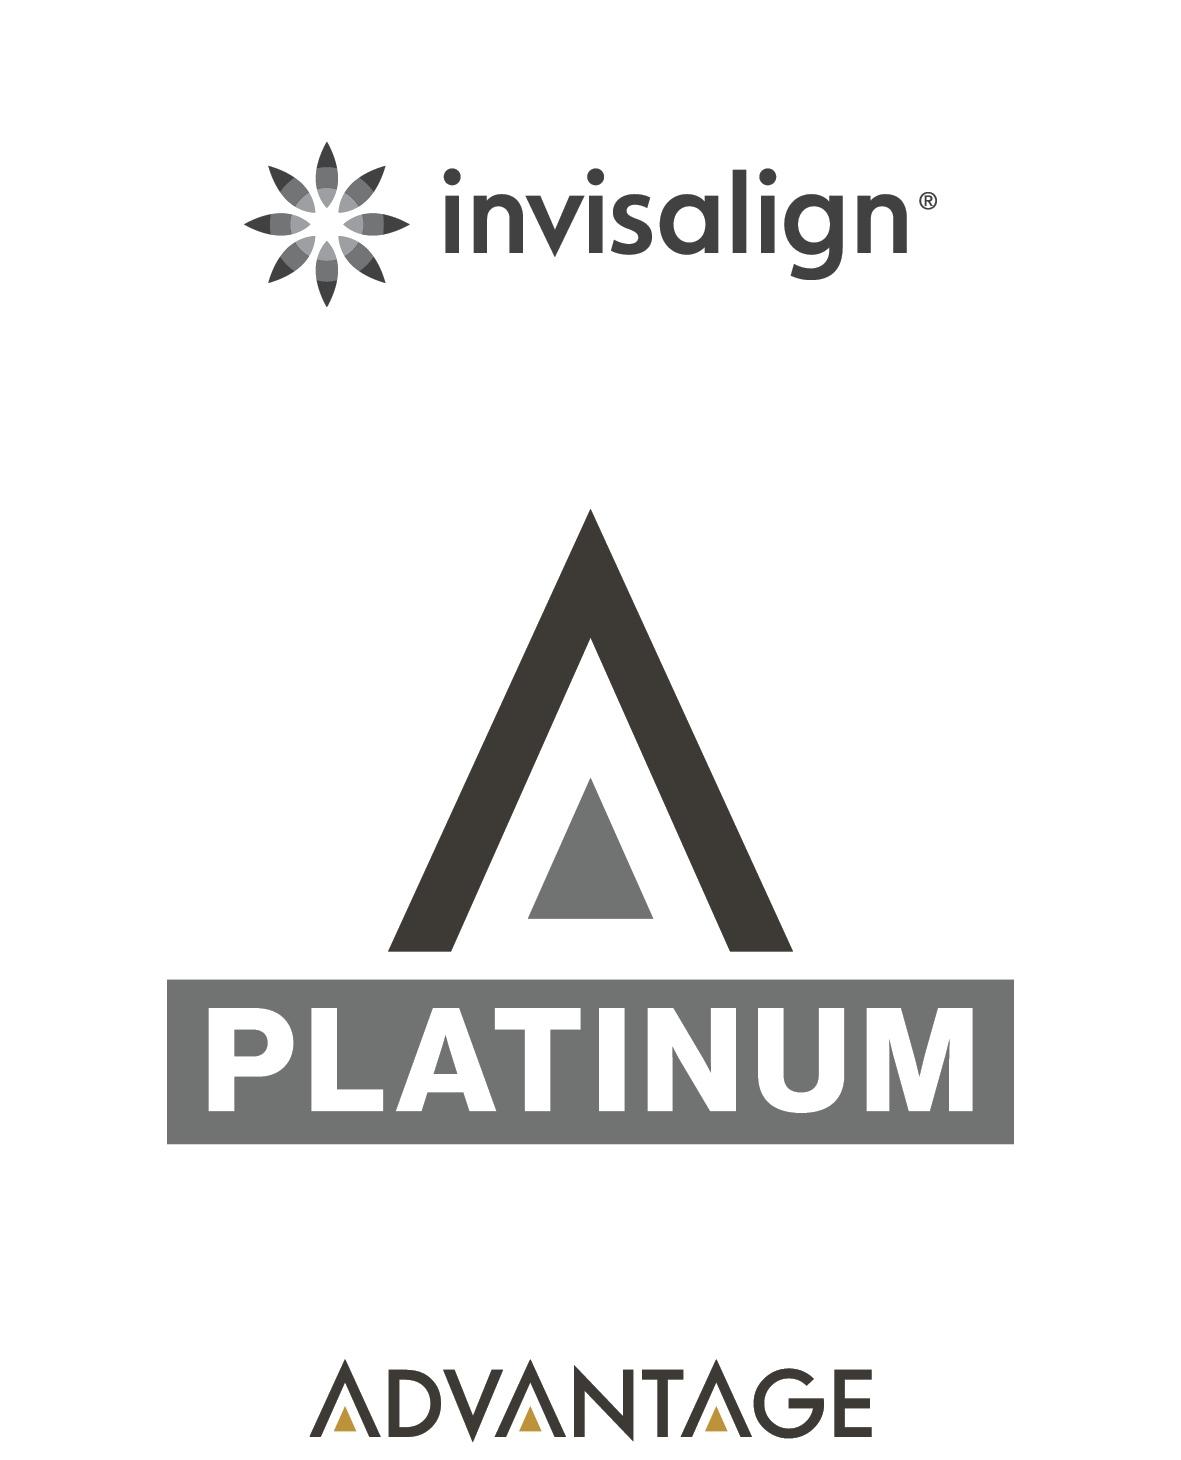 MySmile Dentistry is an Invisalign Platinum Provider